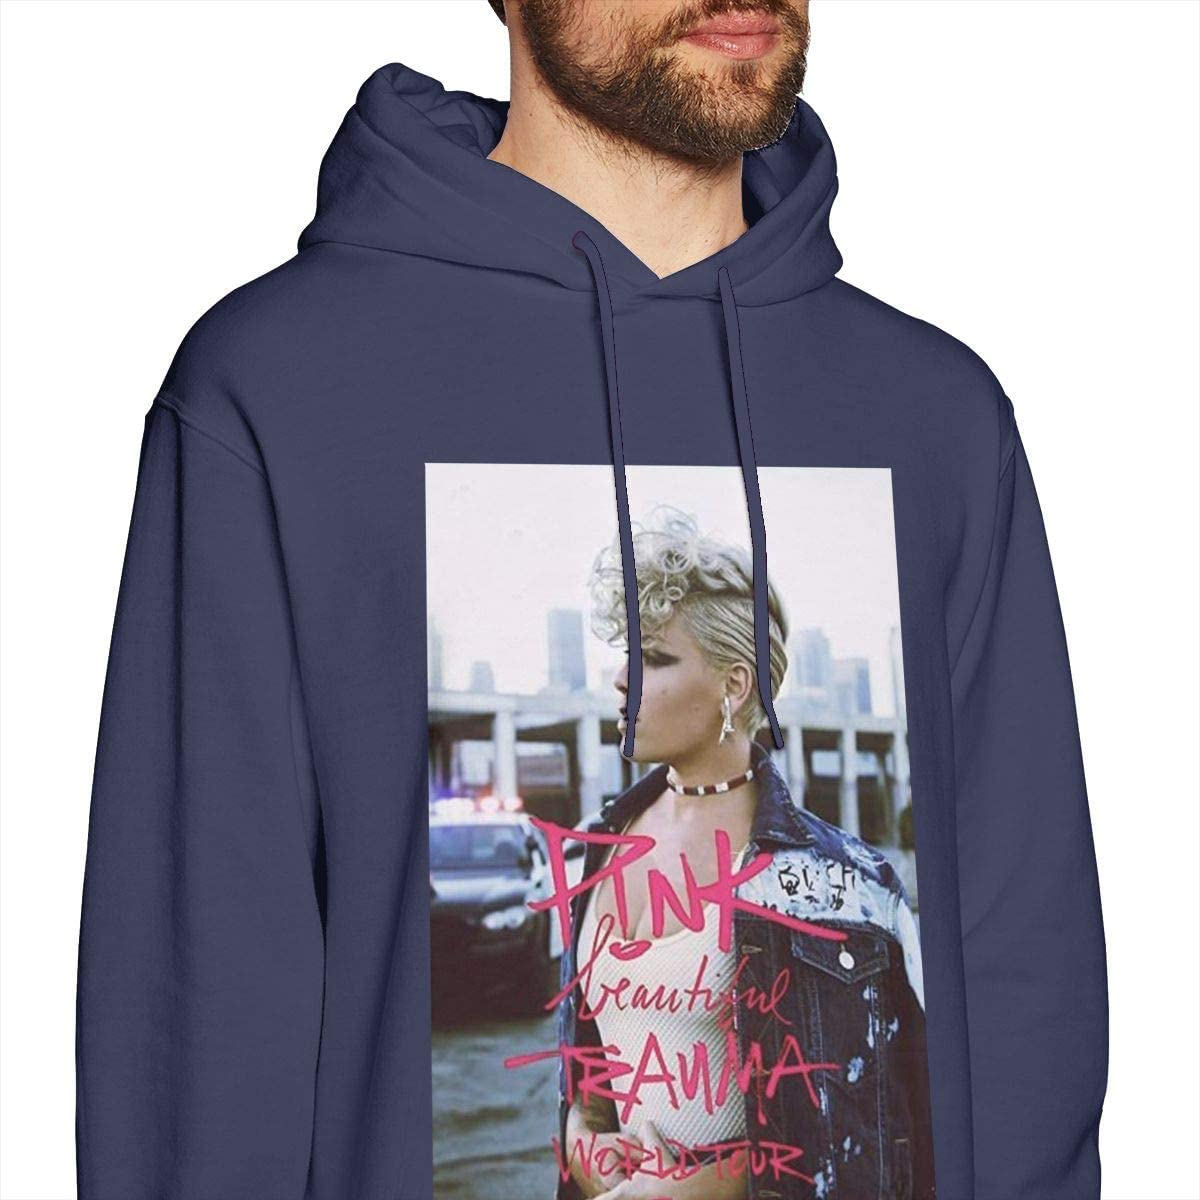 Mens Hooded Sweatshirt Pink Beautiful Trauma Tour 2018 Mrene Unique Classic Fashion Style Navy